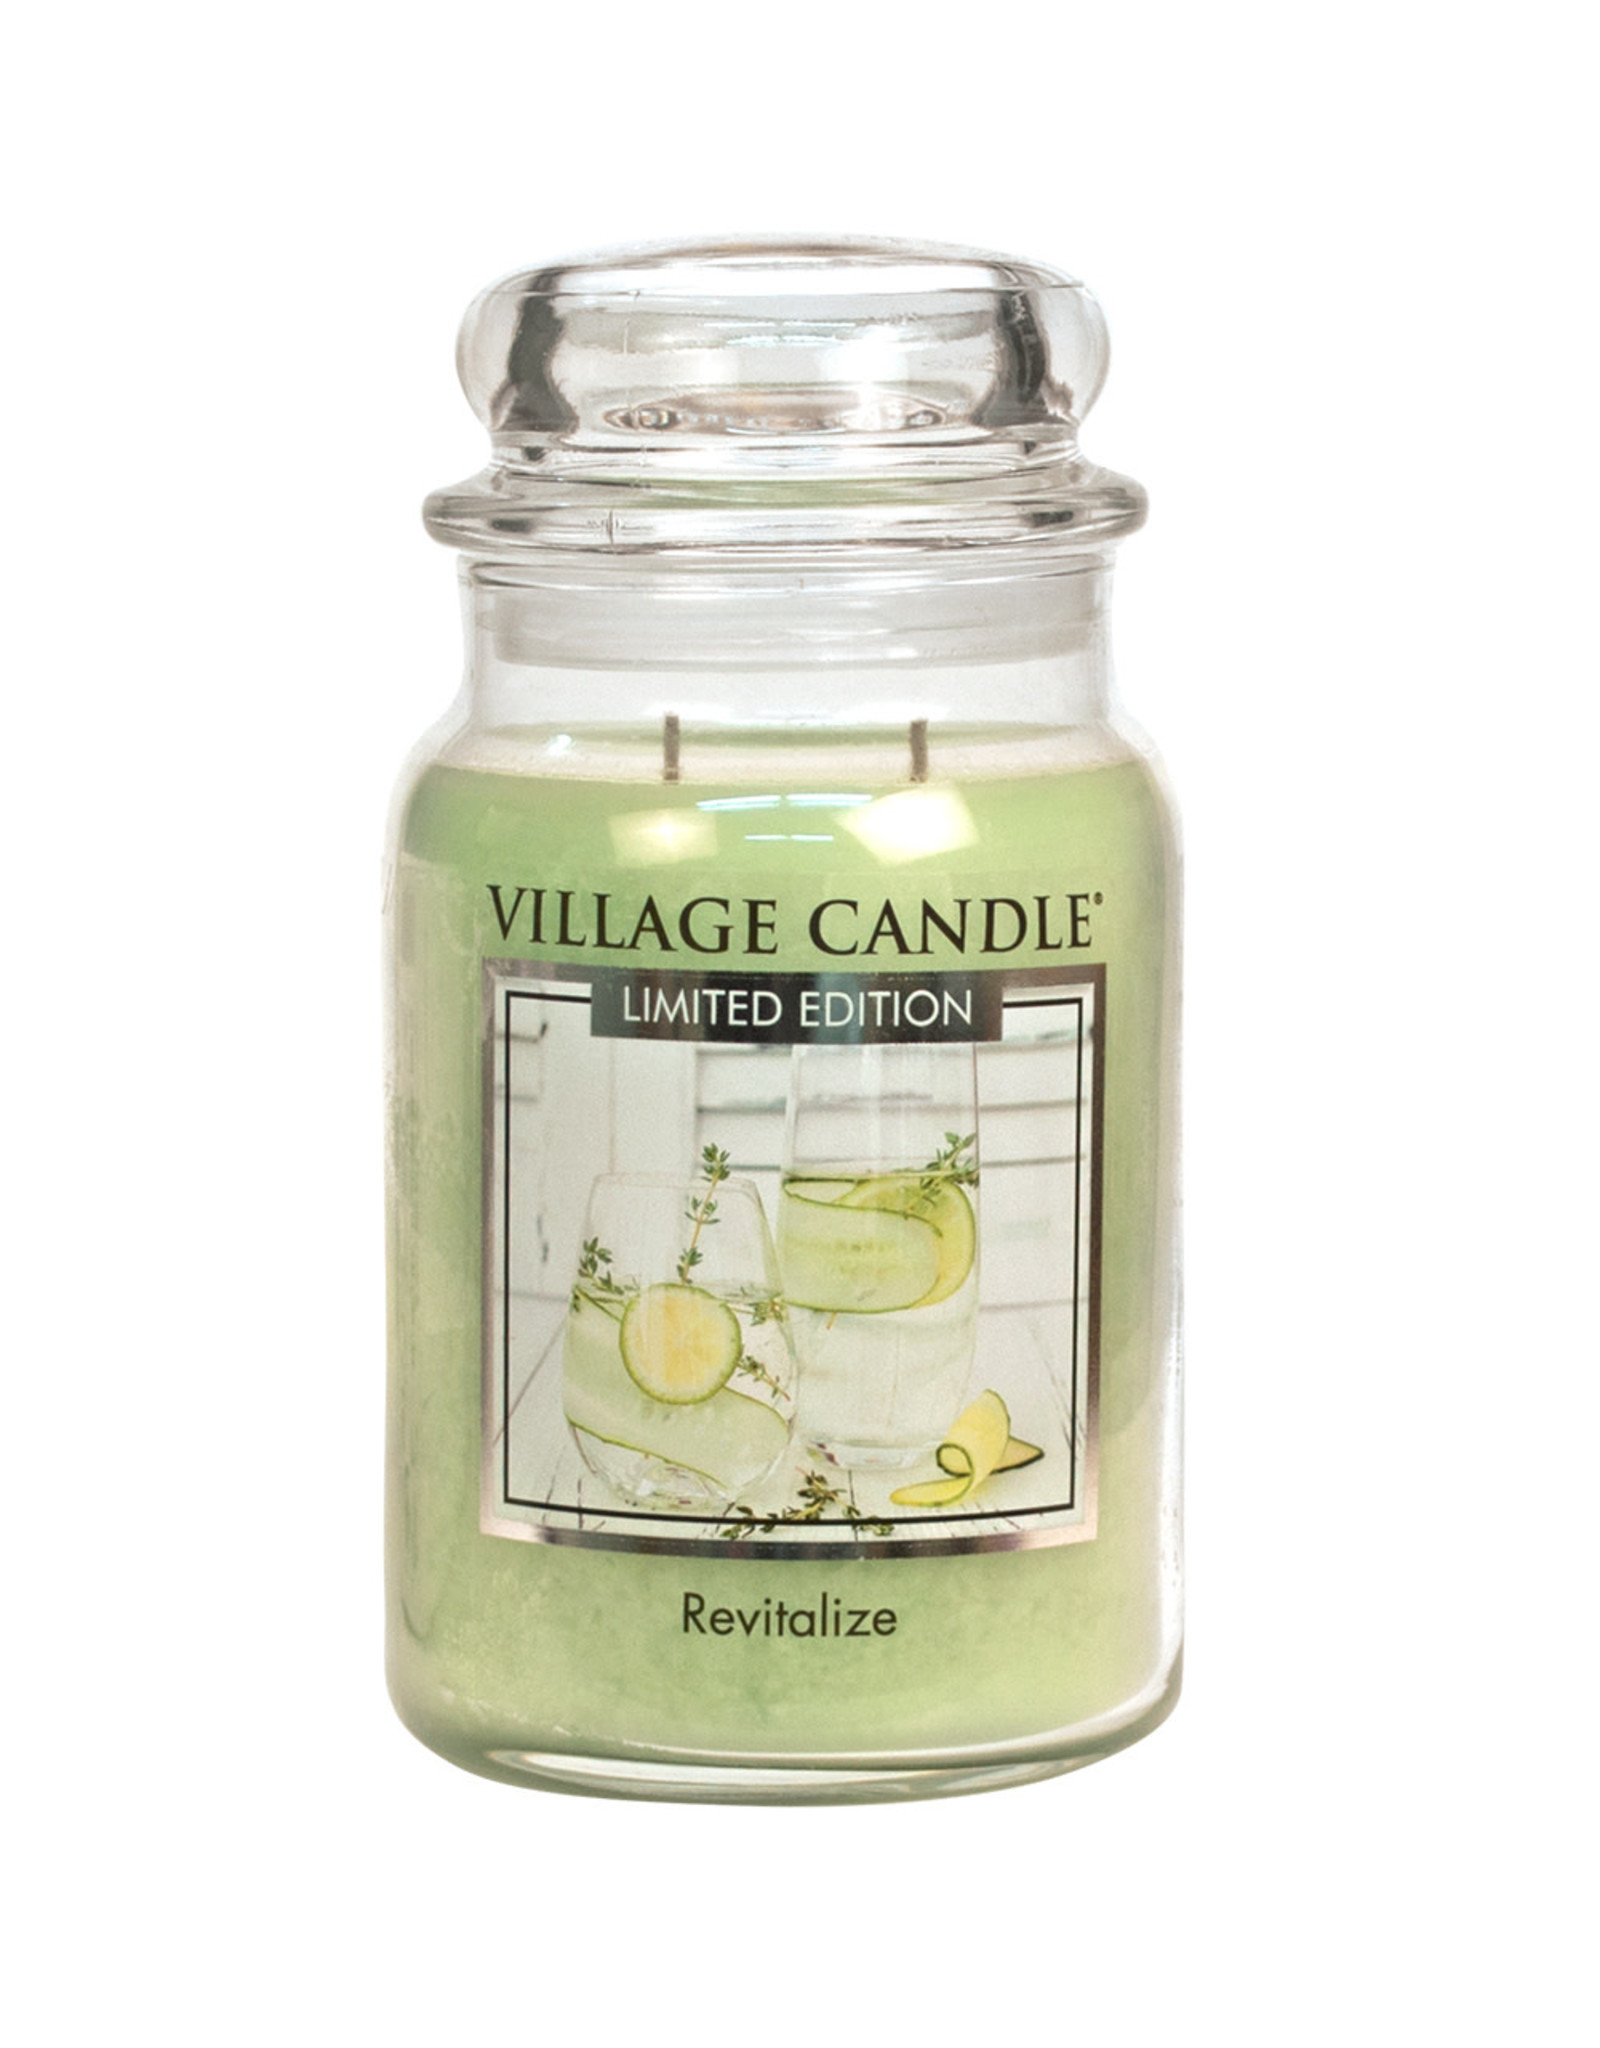 Village Candle REVITALIZE LARGE JAR CANDLE